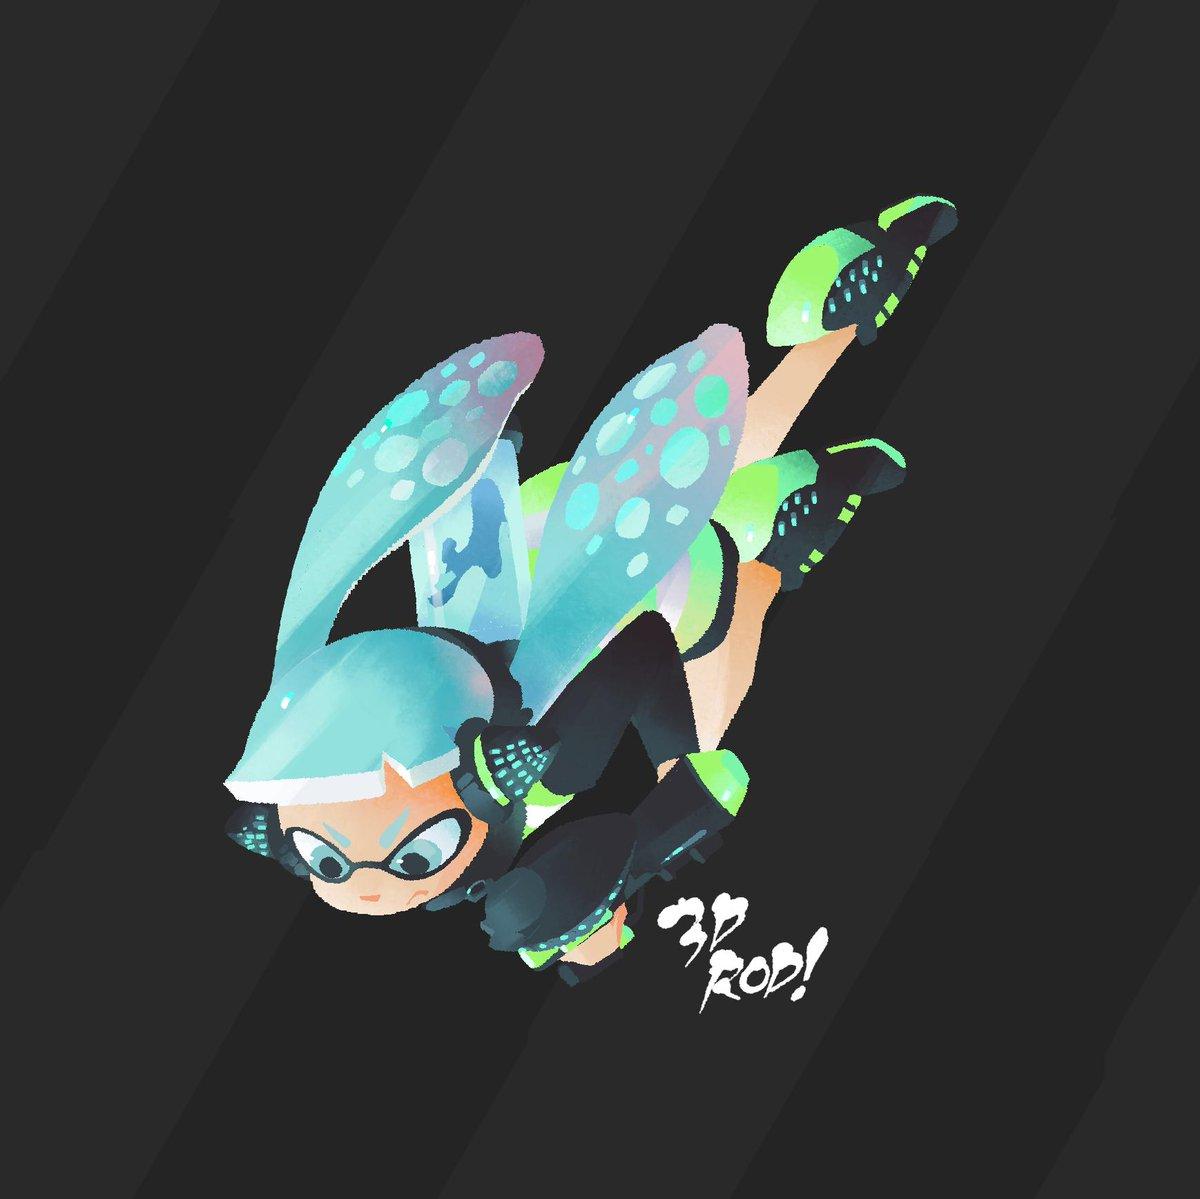 The Squidbeak Splatoon team!  #Splatoon2 #スプラトゥーン2<br>http://pic.twitter.com/VzEwmLEx5x